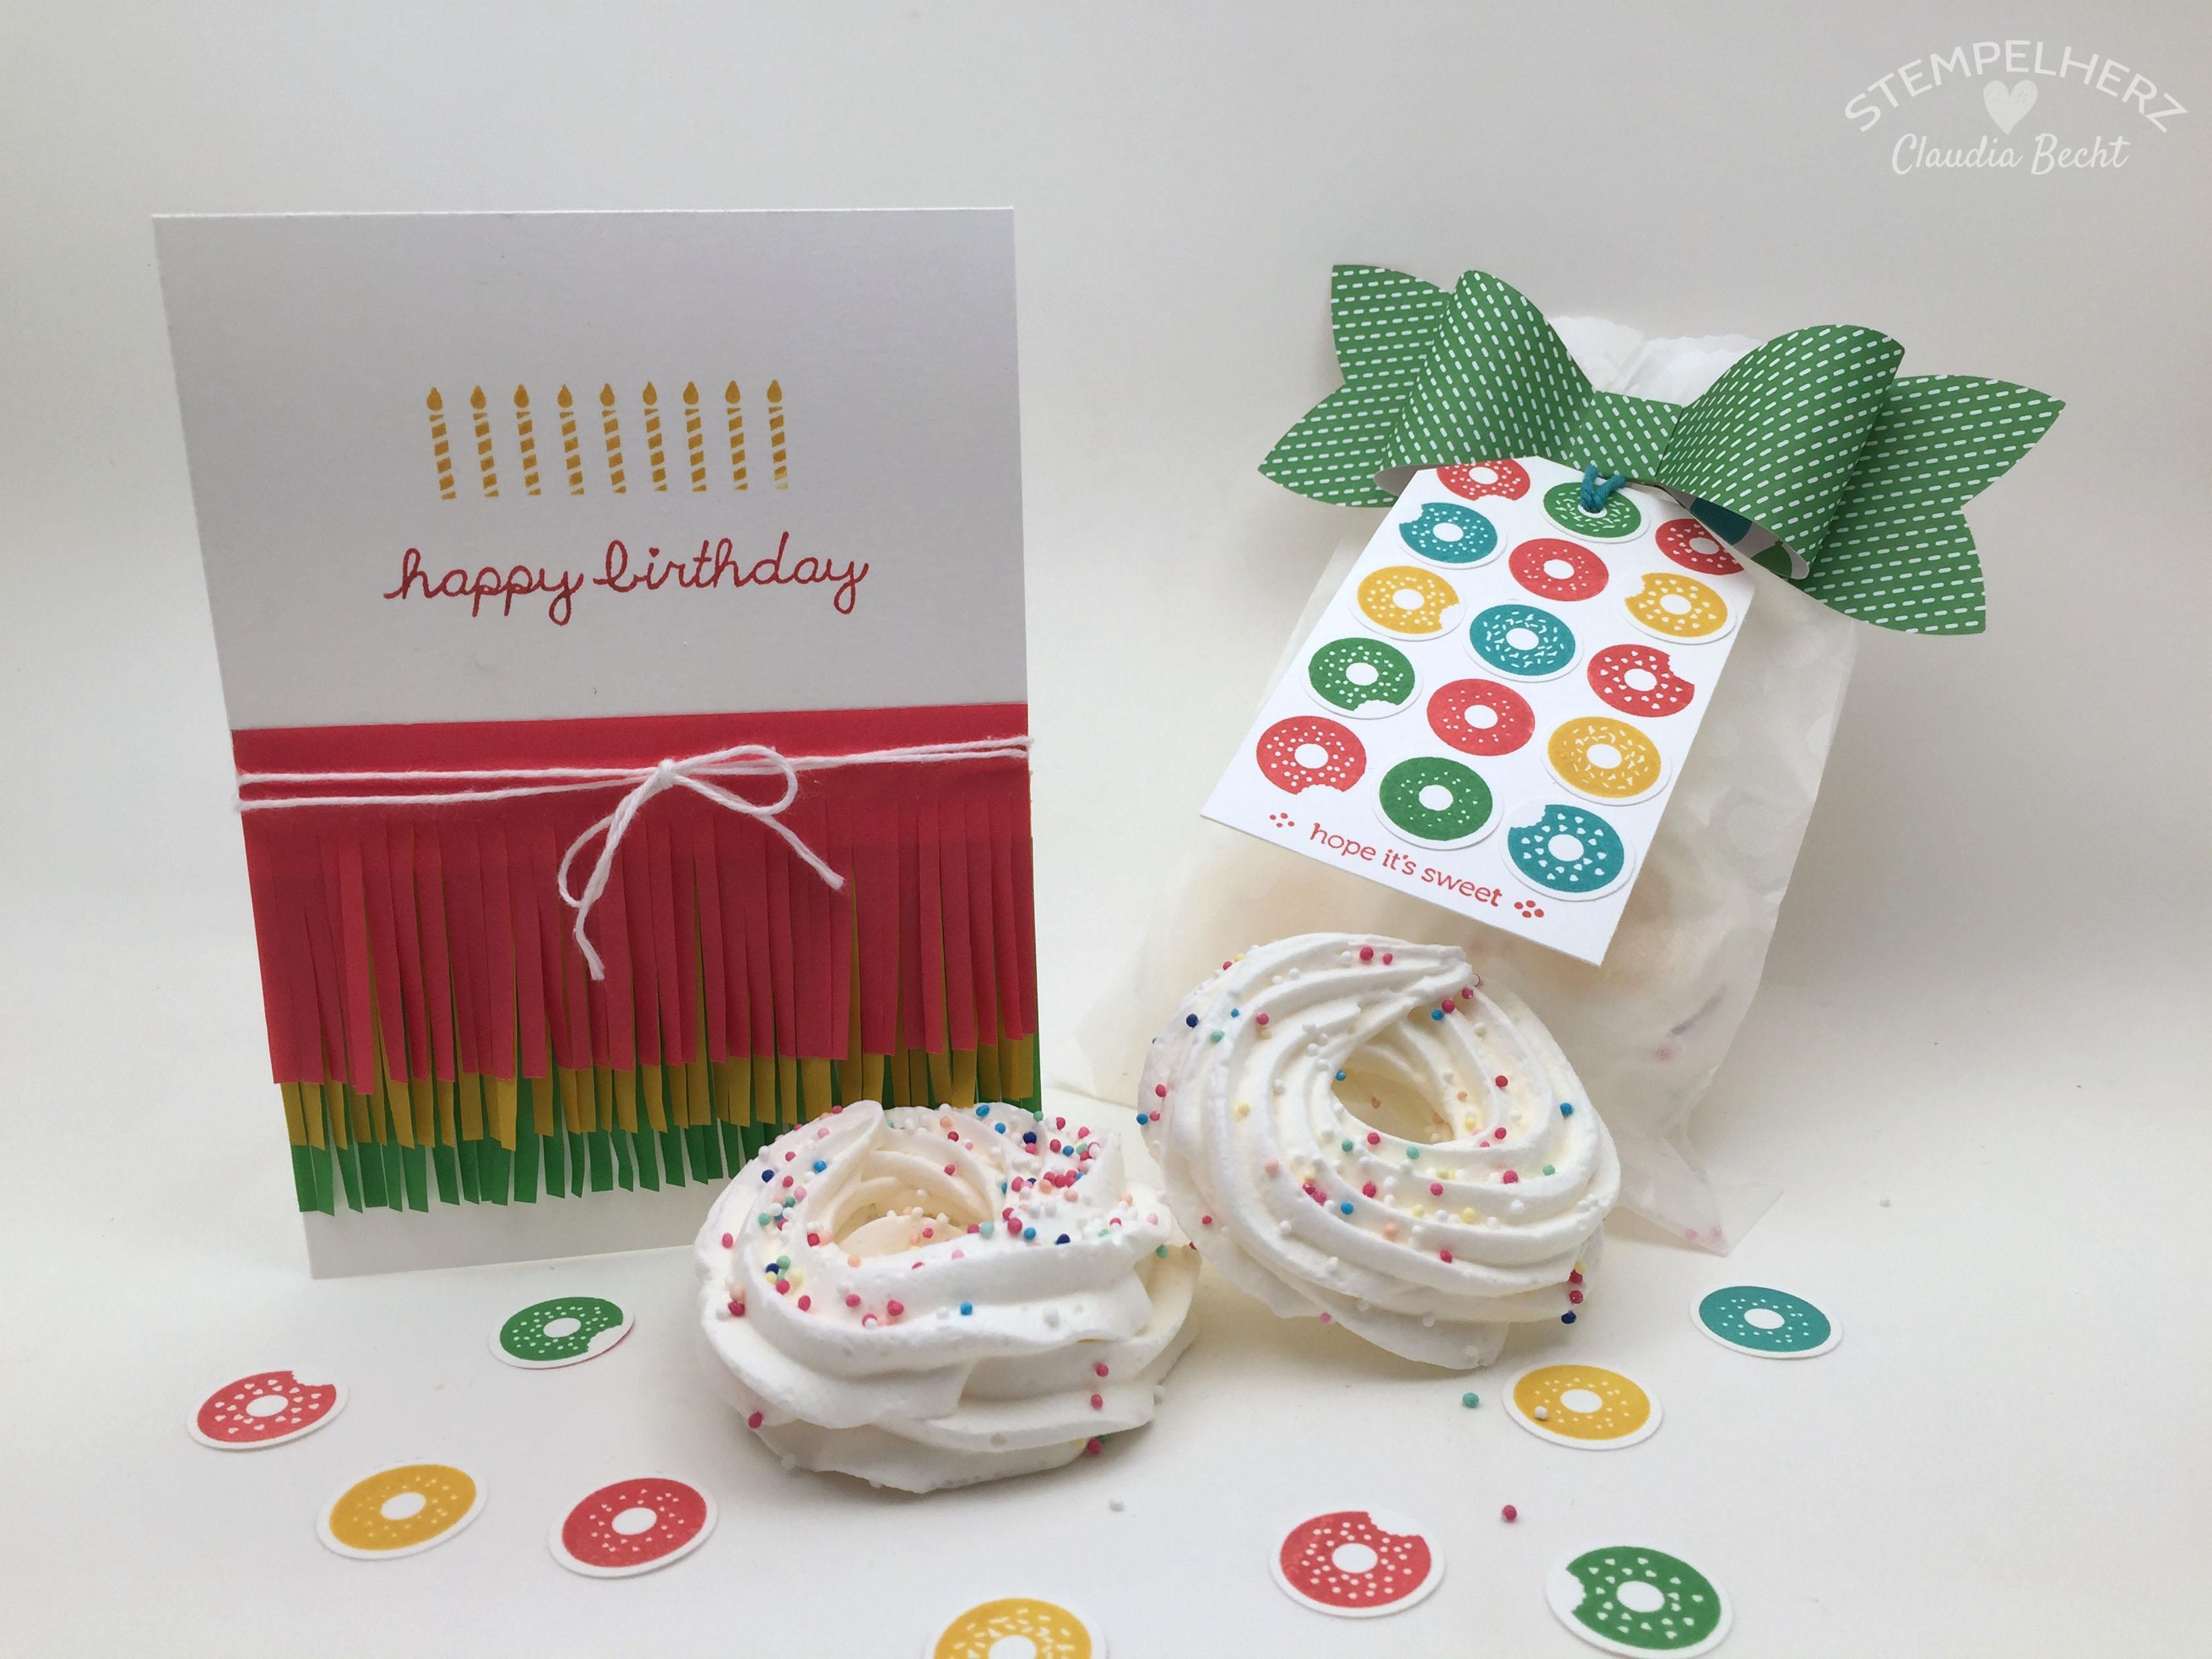 Stampin Up-Stempelherz-Geburtstag-Verpackung-Bag-Geburtstagskarte-Zeig es am Montag Geburtstagsset Sprinkles on Top 34.2b